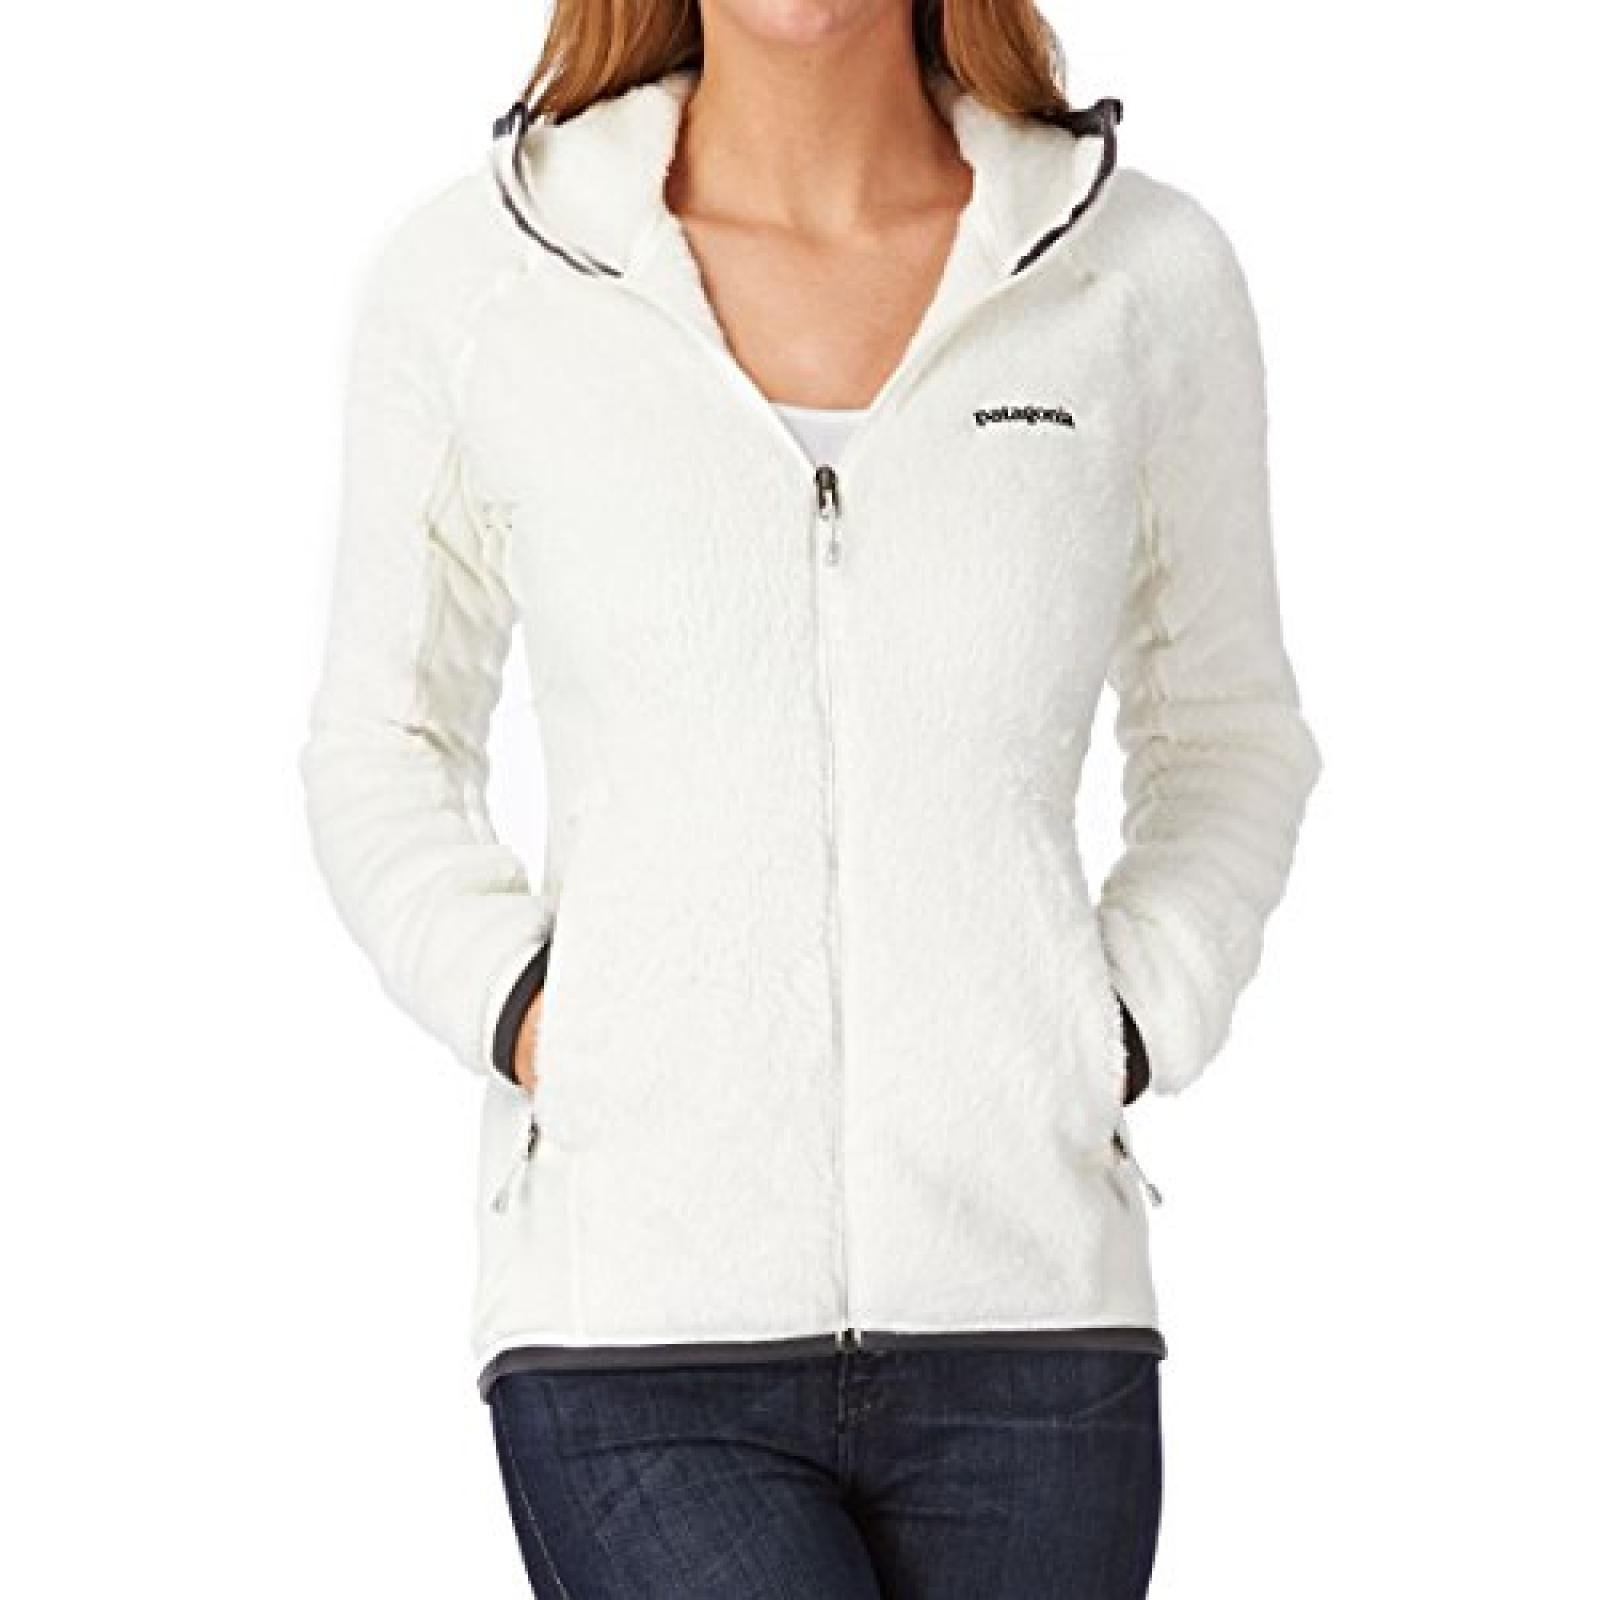 Patagonia R3 Hooded Fleece - Birch White